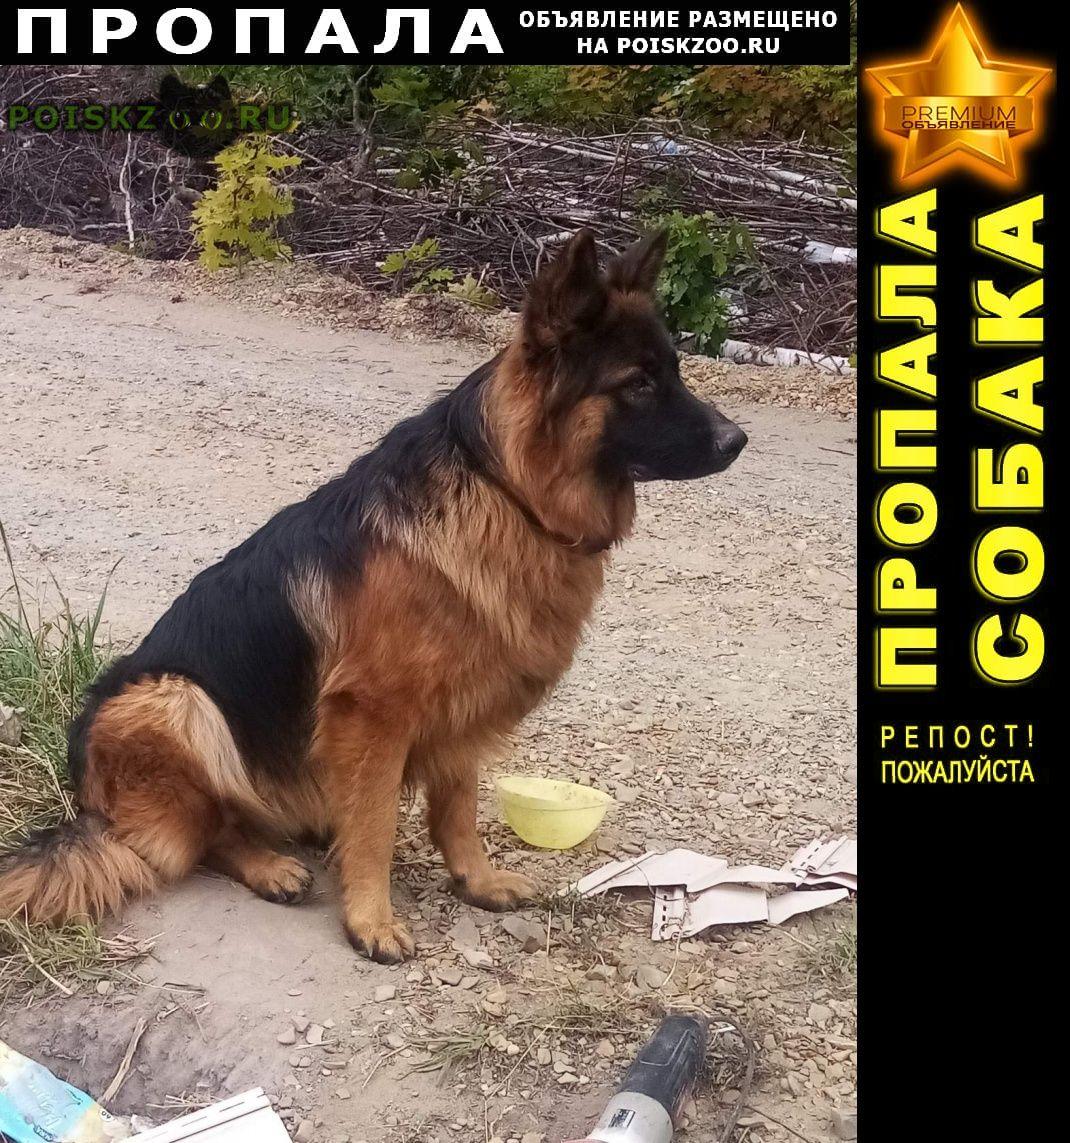 Пропала собака кобель немецкой овчарки Пенза